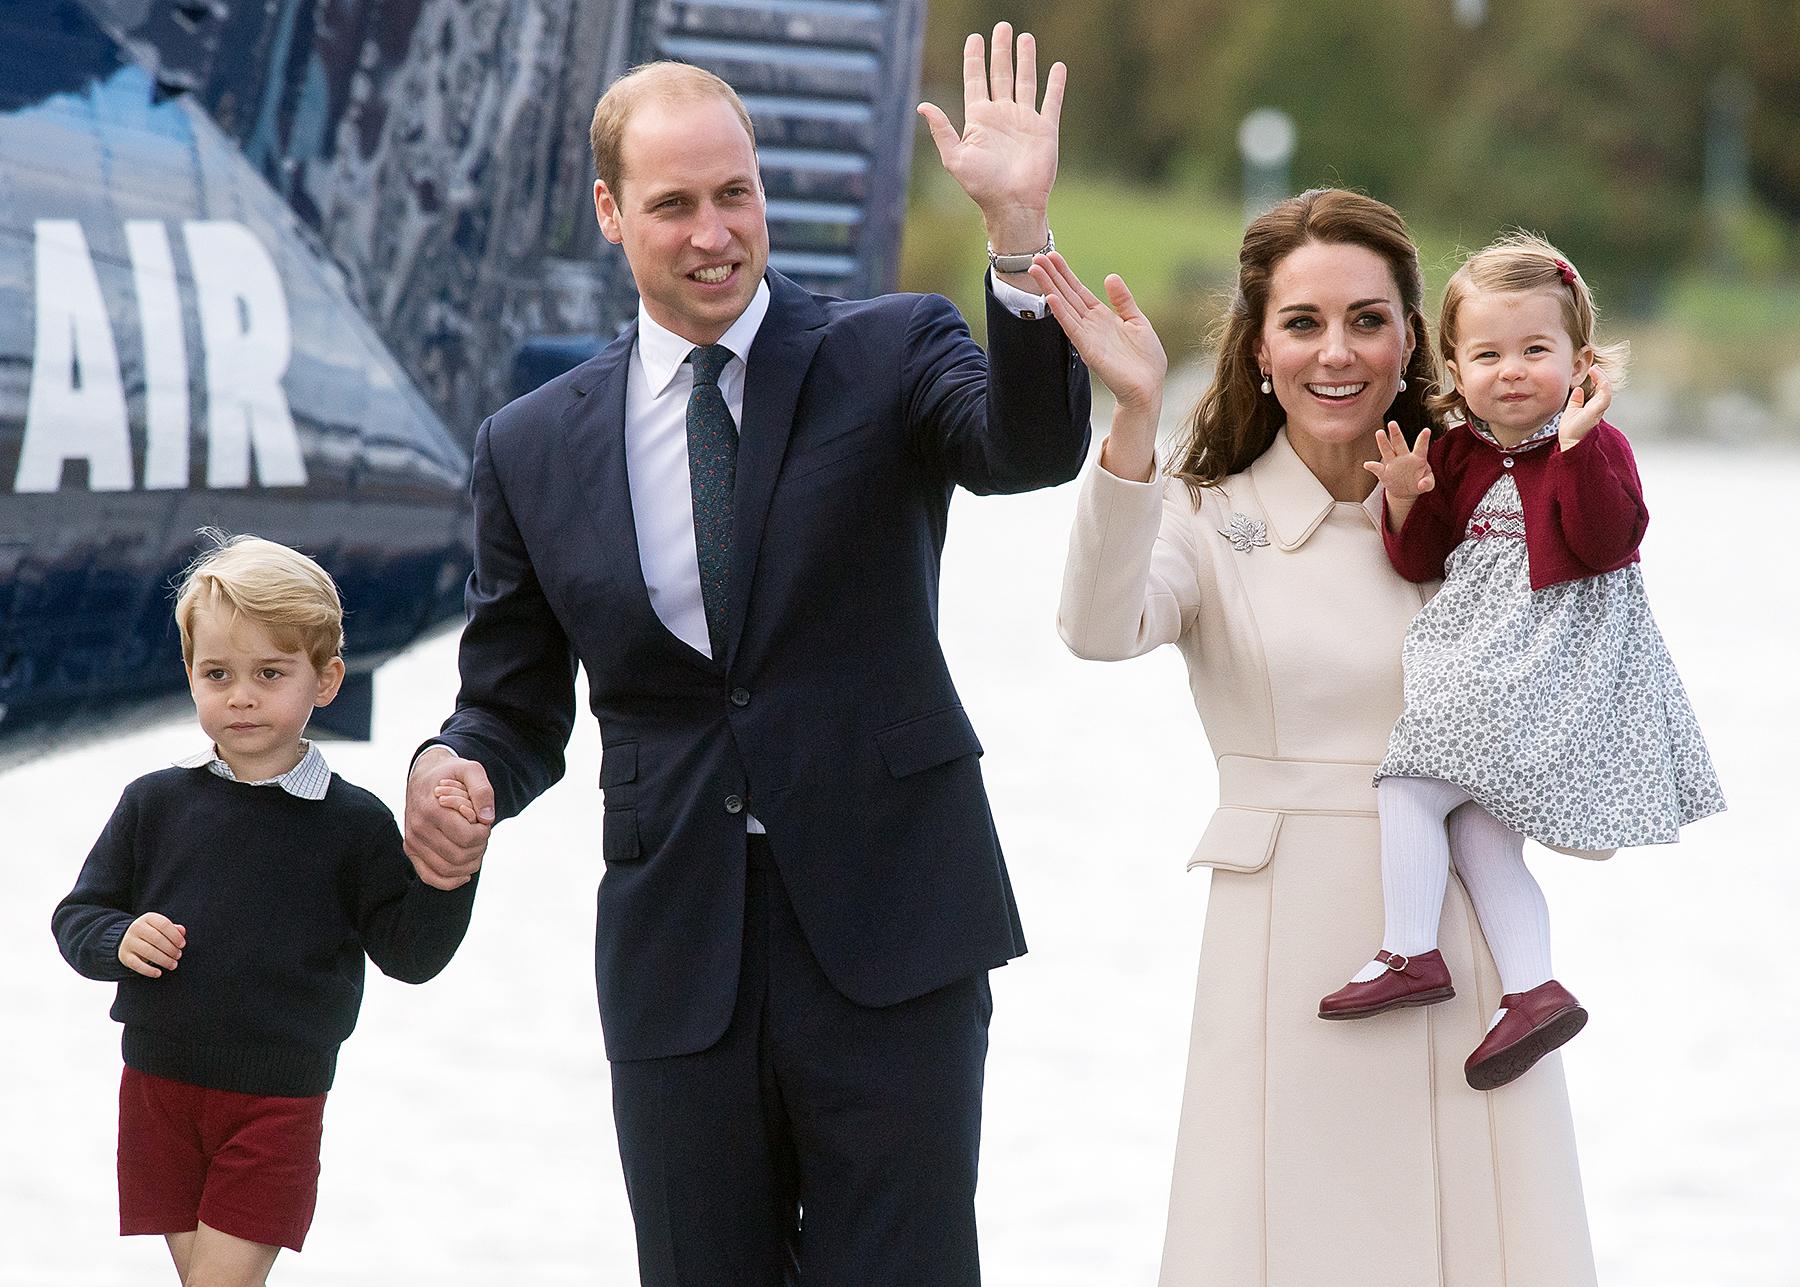 Prince George Prince William Kate Middleton Princess Charlotte